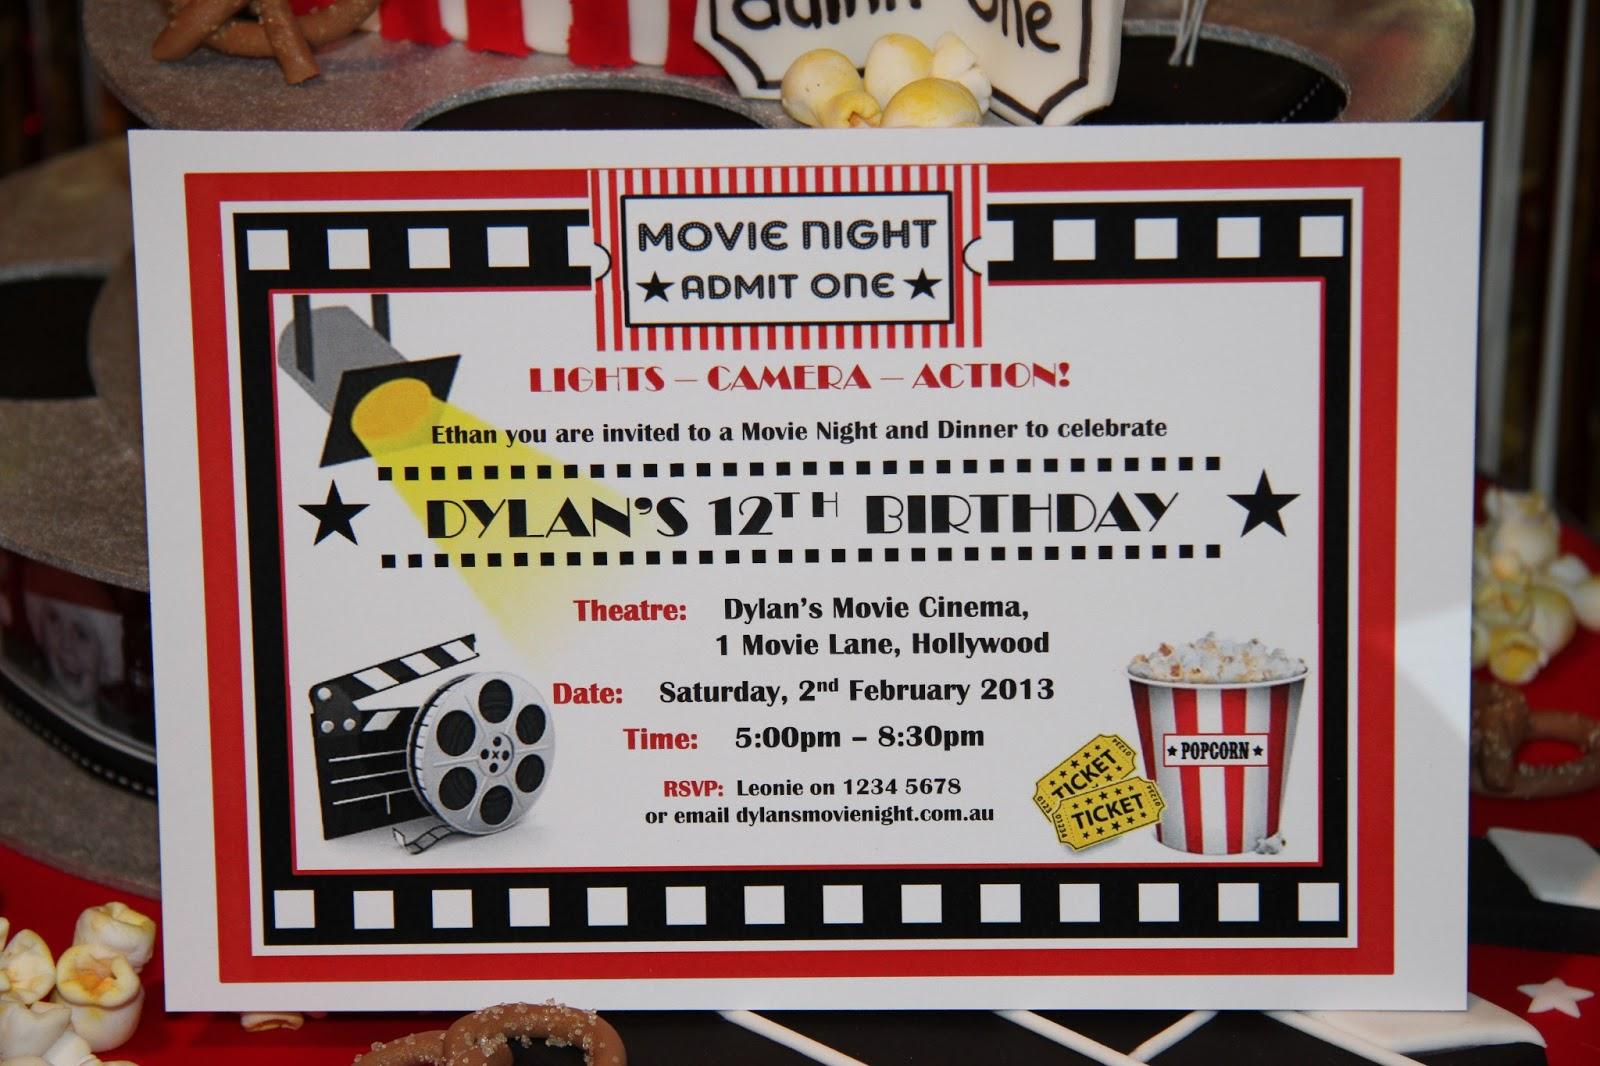 movie night invite template - Boat.jeremyeaton.co